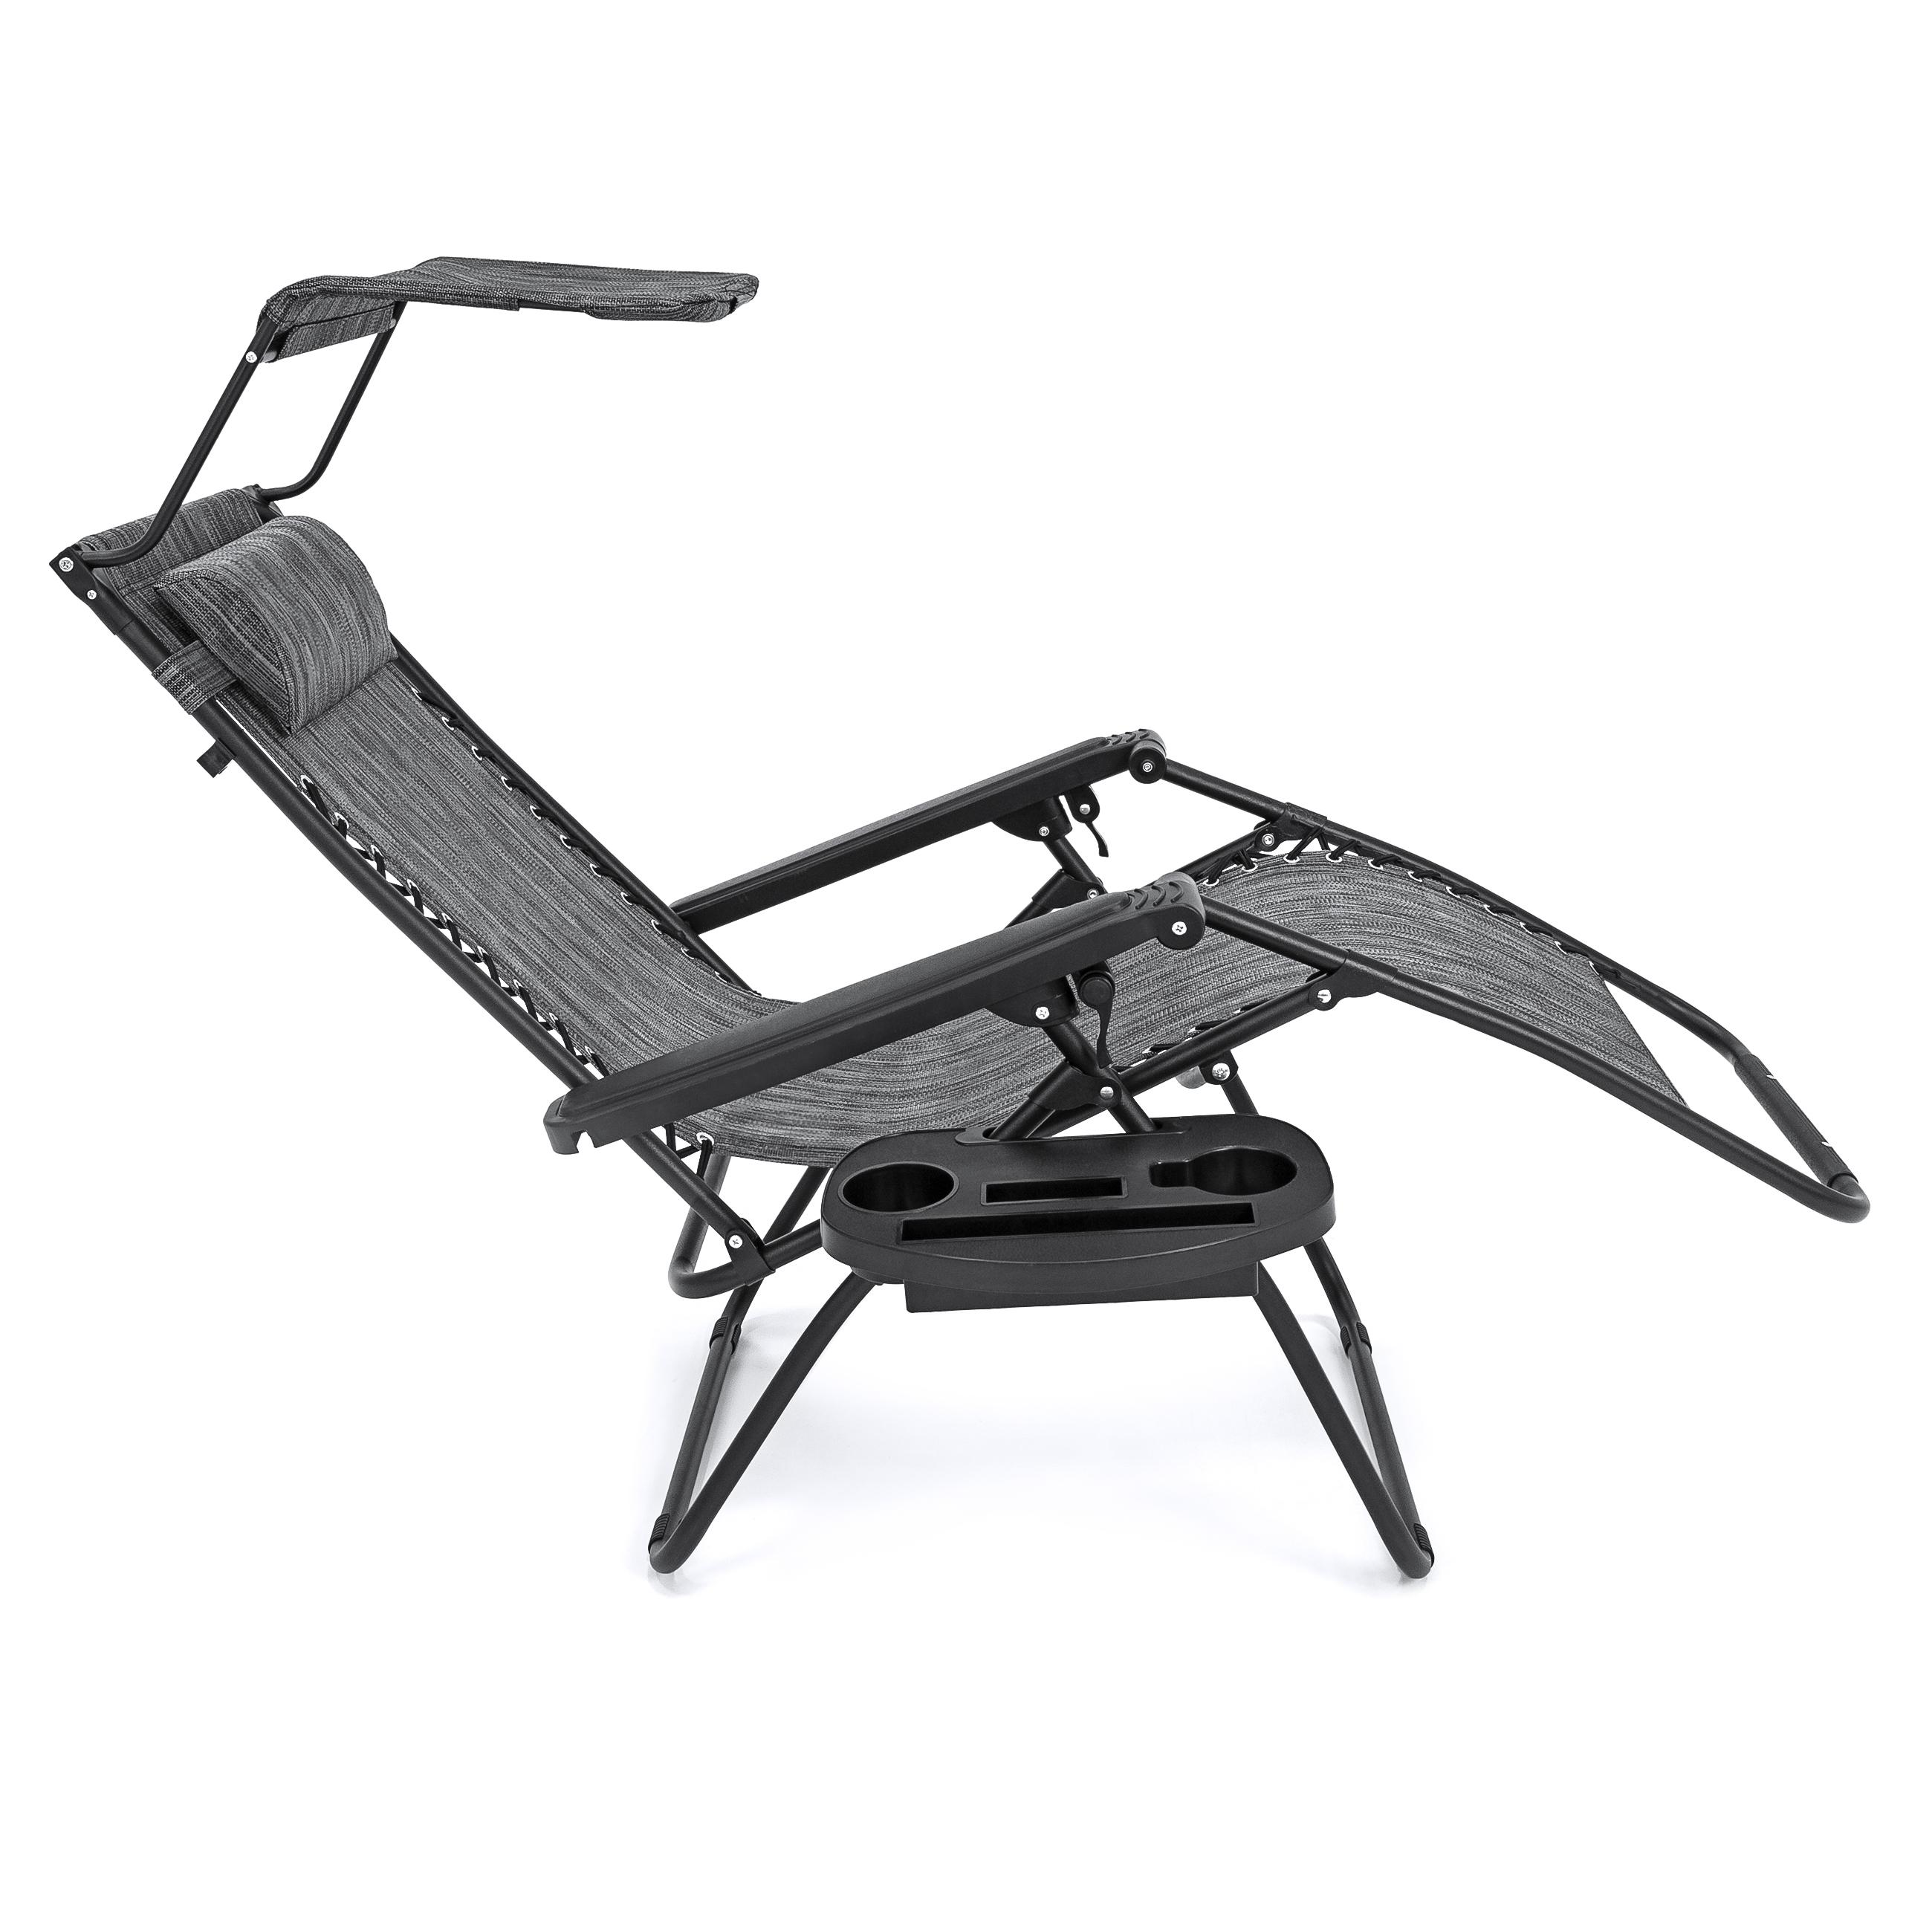 Folding Zero Gravity Recliner Lounge Chair Canopy Shade